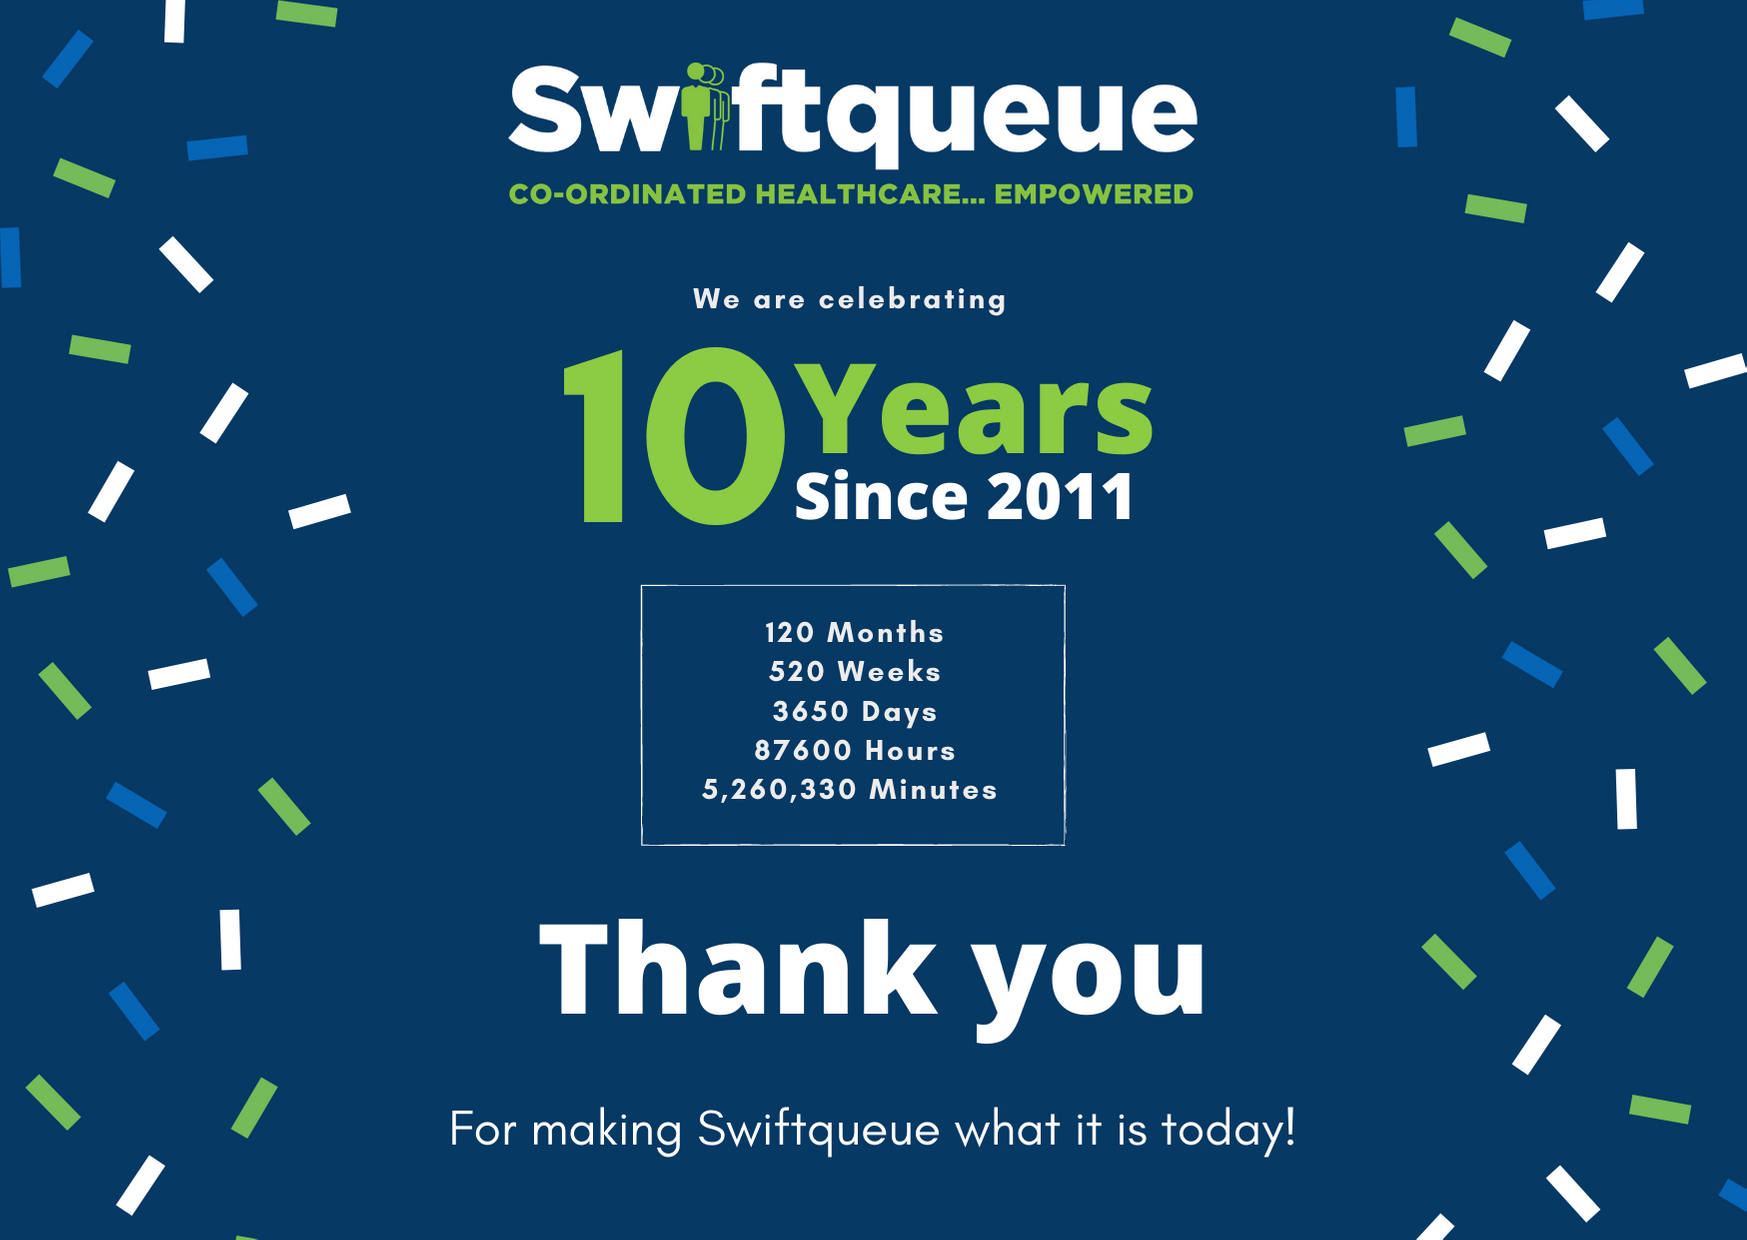 Celebrating 10 Years of Swiftqueue